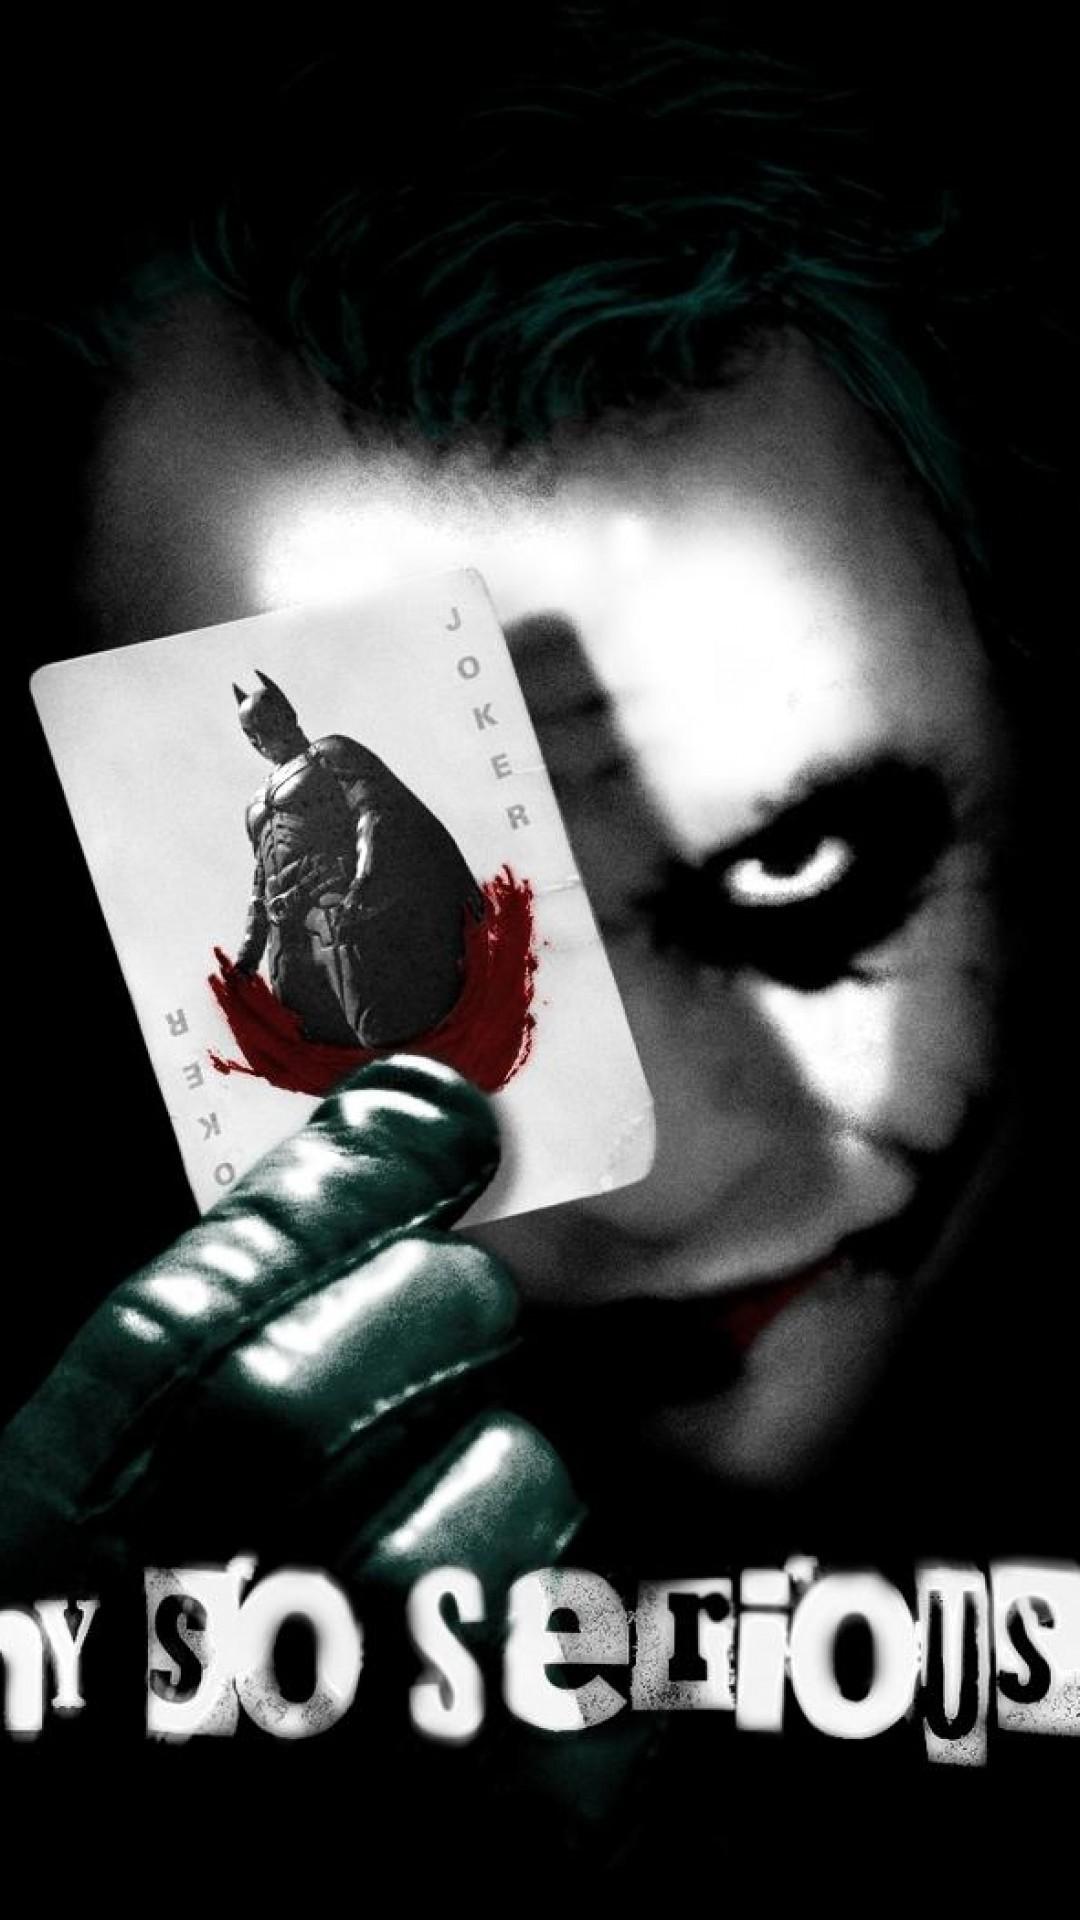 Why So Serious, Joker, Batman, Card, Heath Ledger